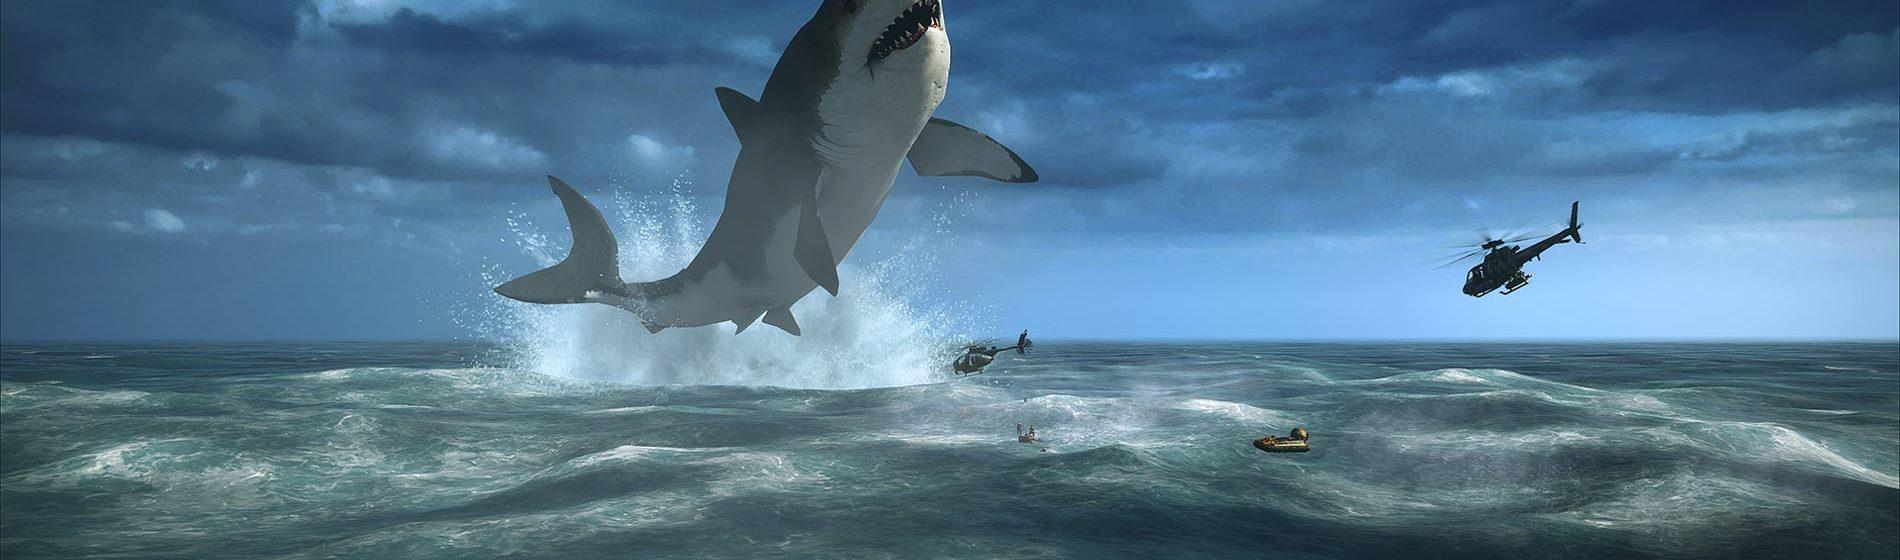 Battlefield 4 - Megalodon